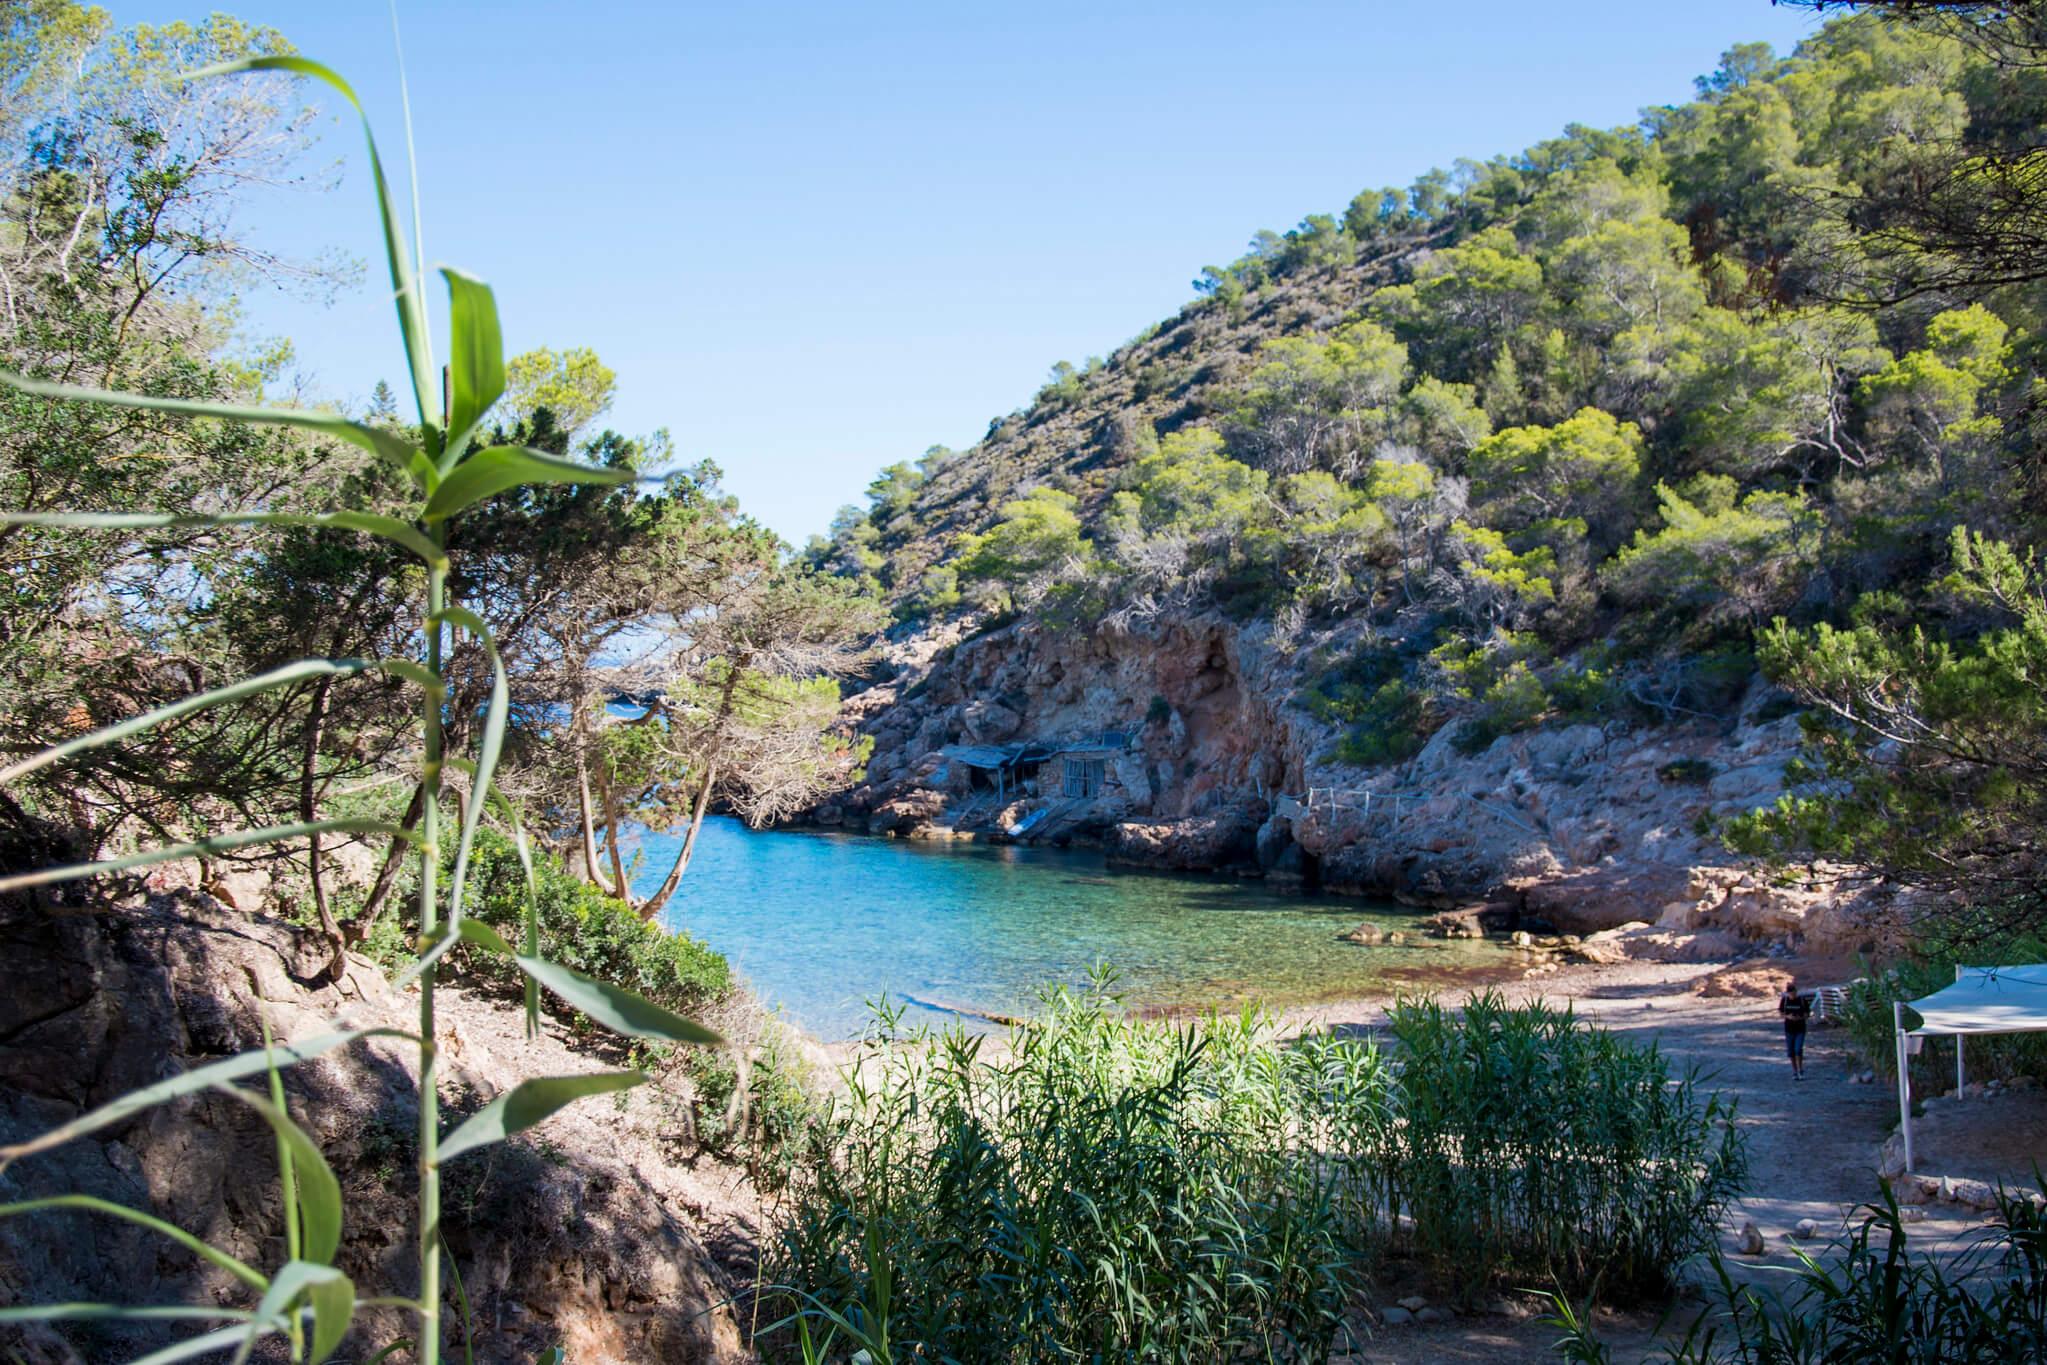 https://www.white-ibiza.com/wp-content/uploads/2020/03/ibiza-beaches-cala-xuclar-02.jpg